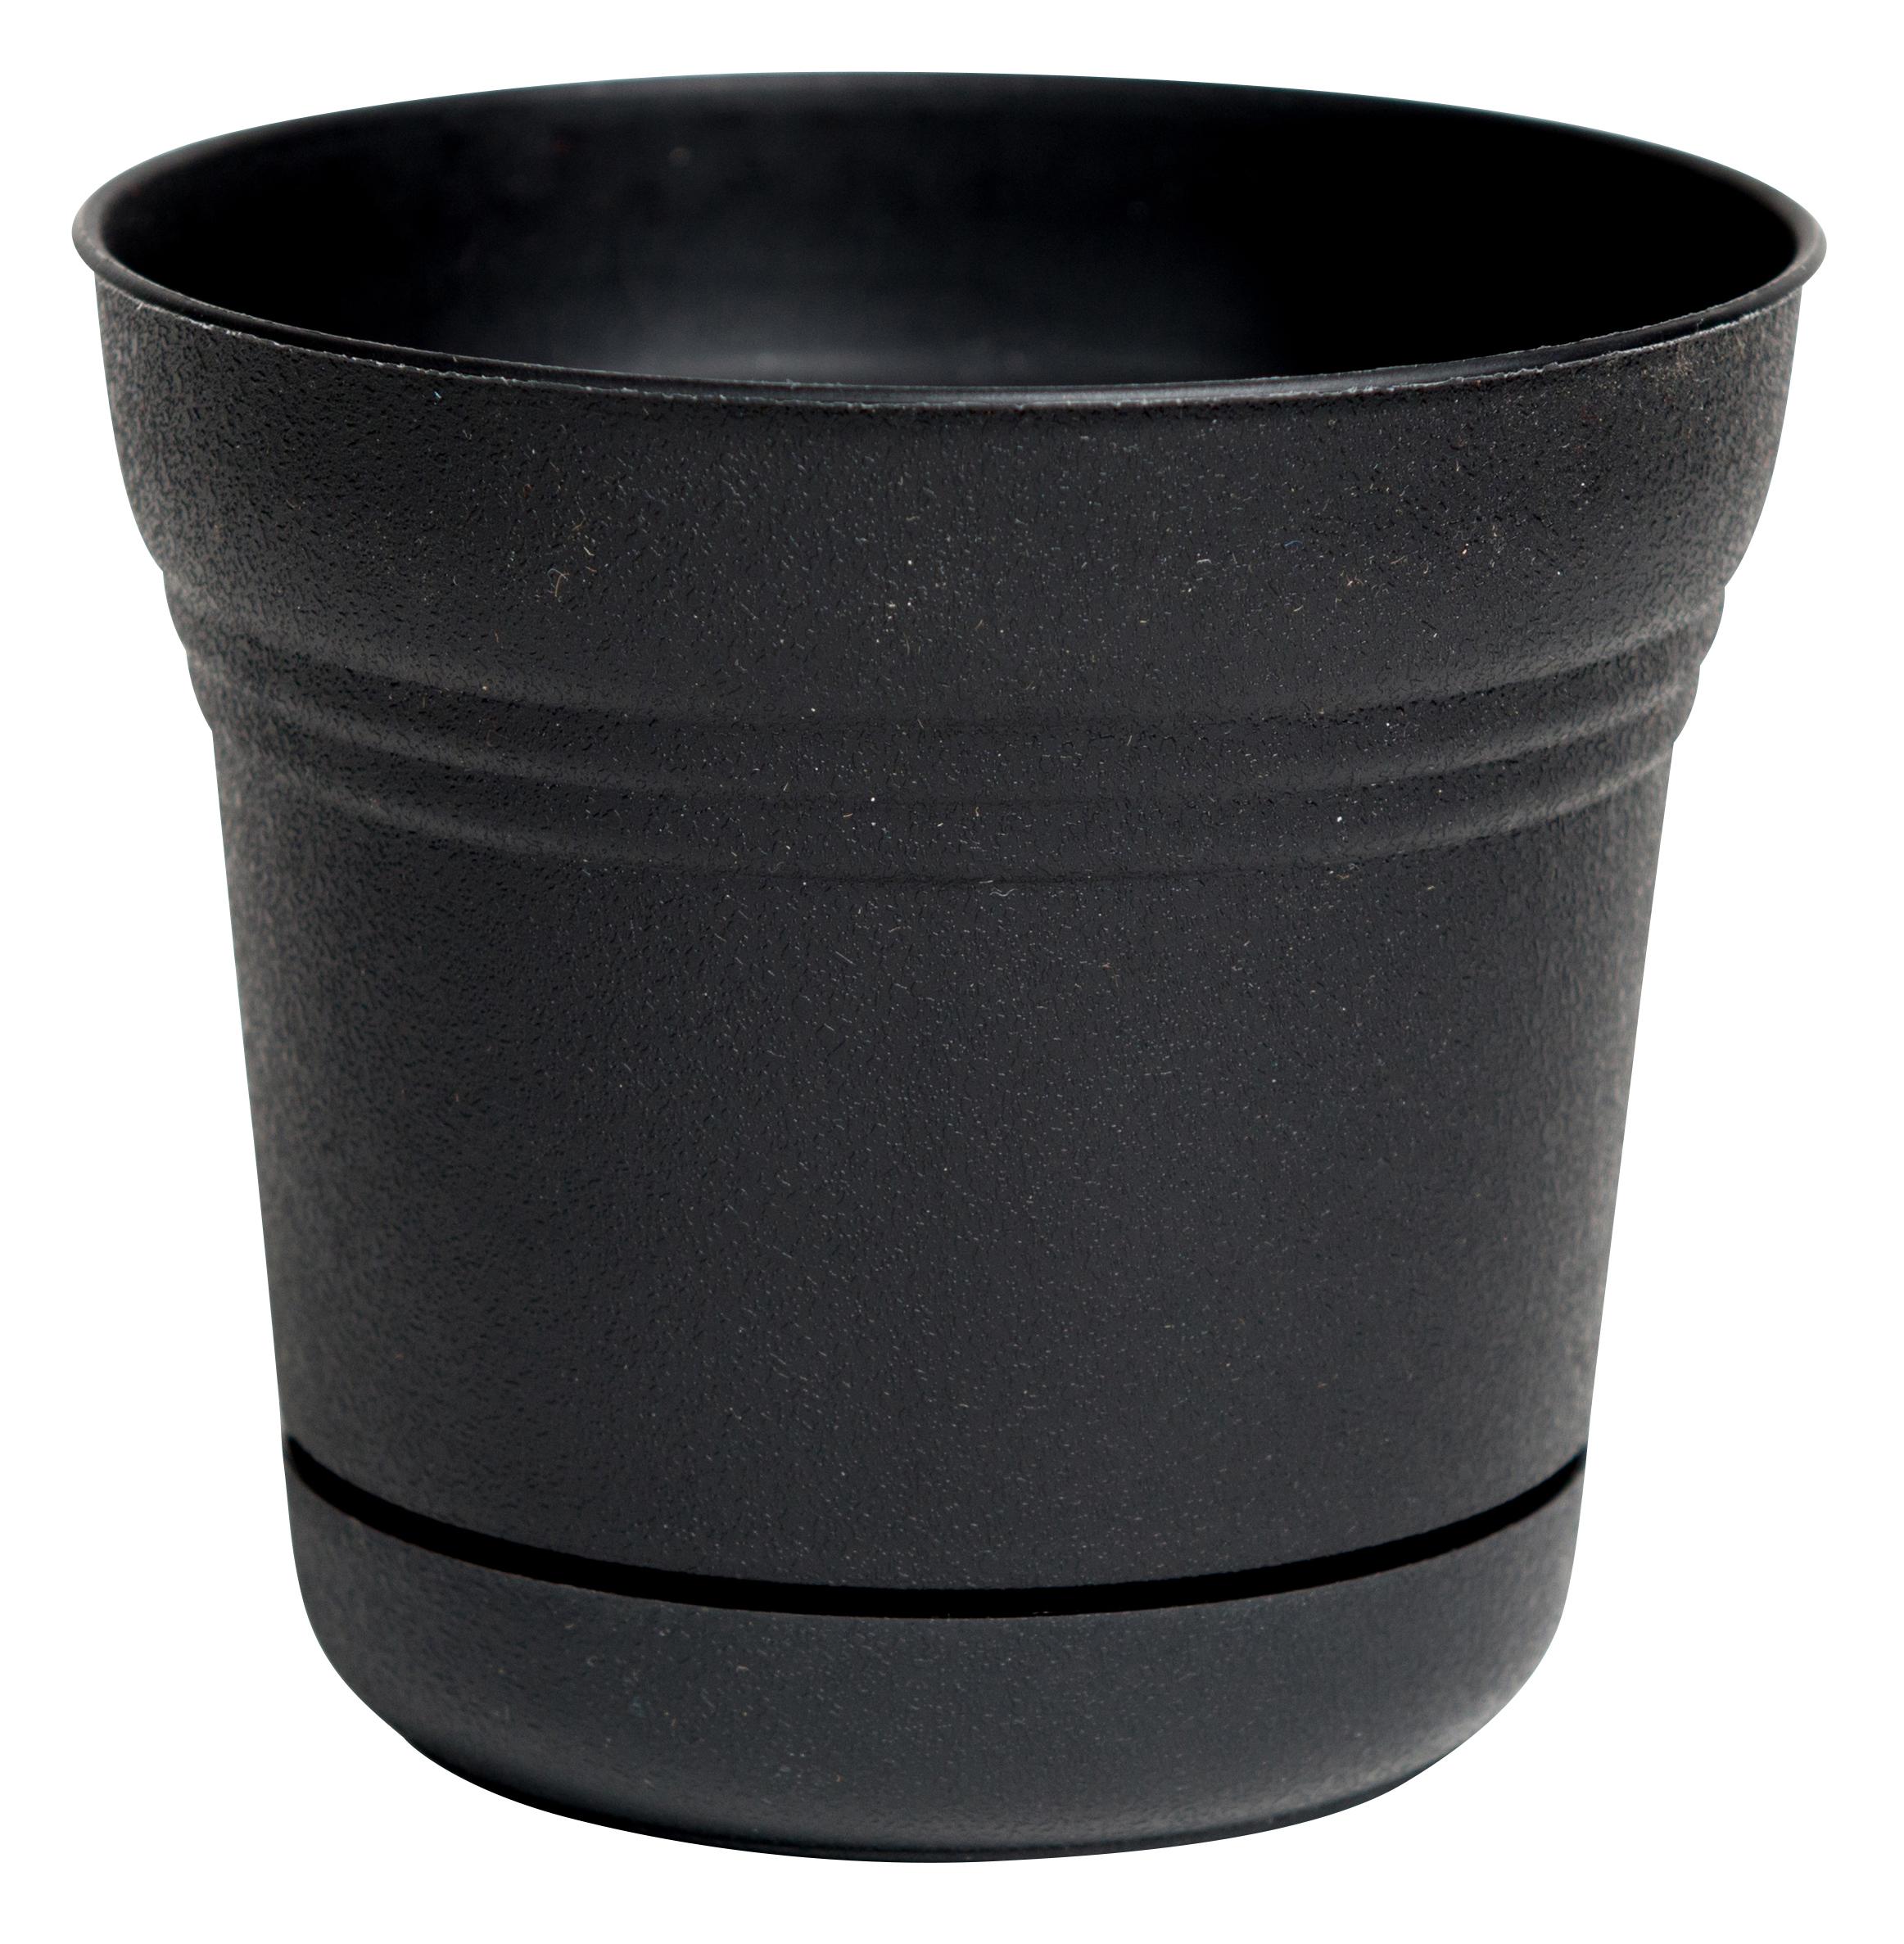 "Bloem Saturn Planter with Saucer 5"" Black"